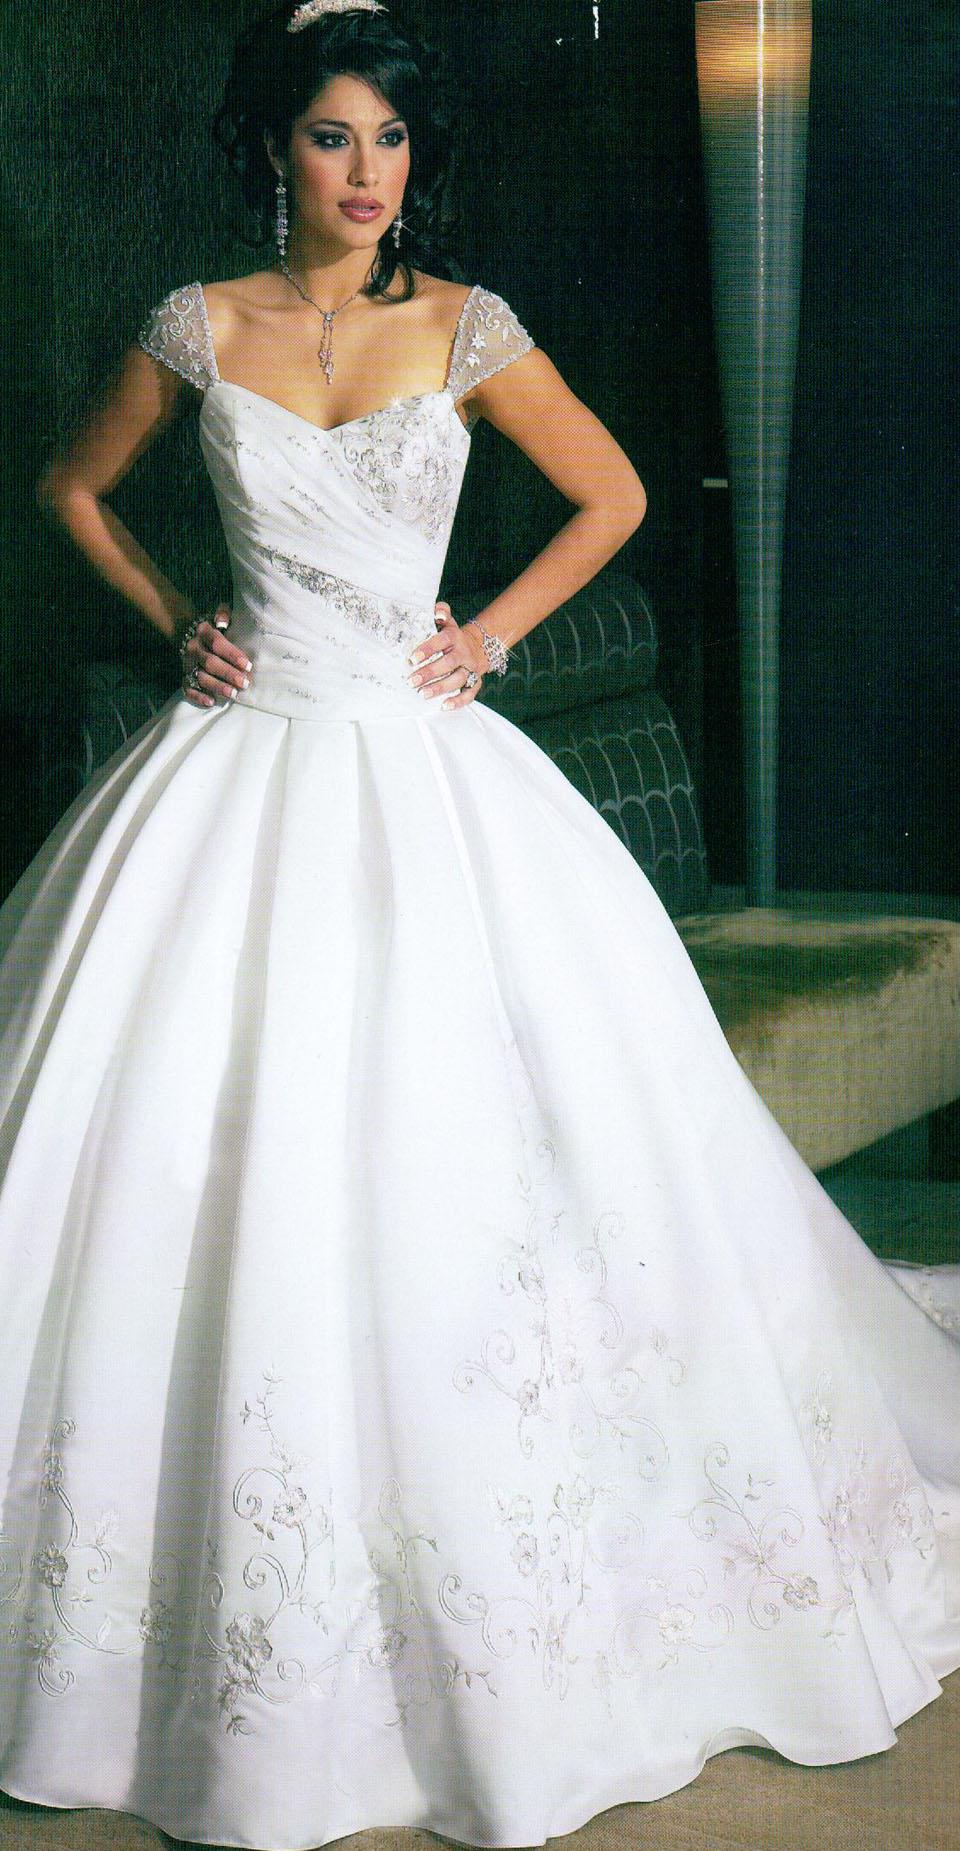 renting wedding dresses in vegas rental wedding dresses Renting Wedding Dresses In Vegas